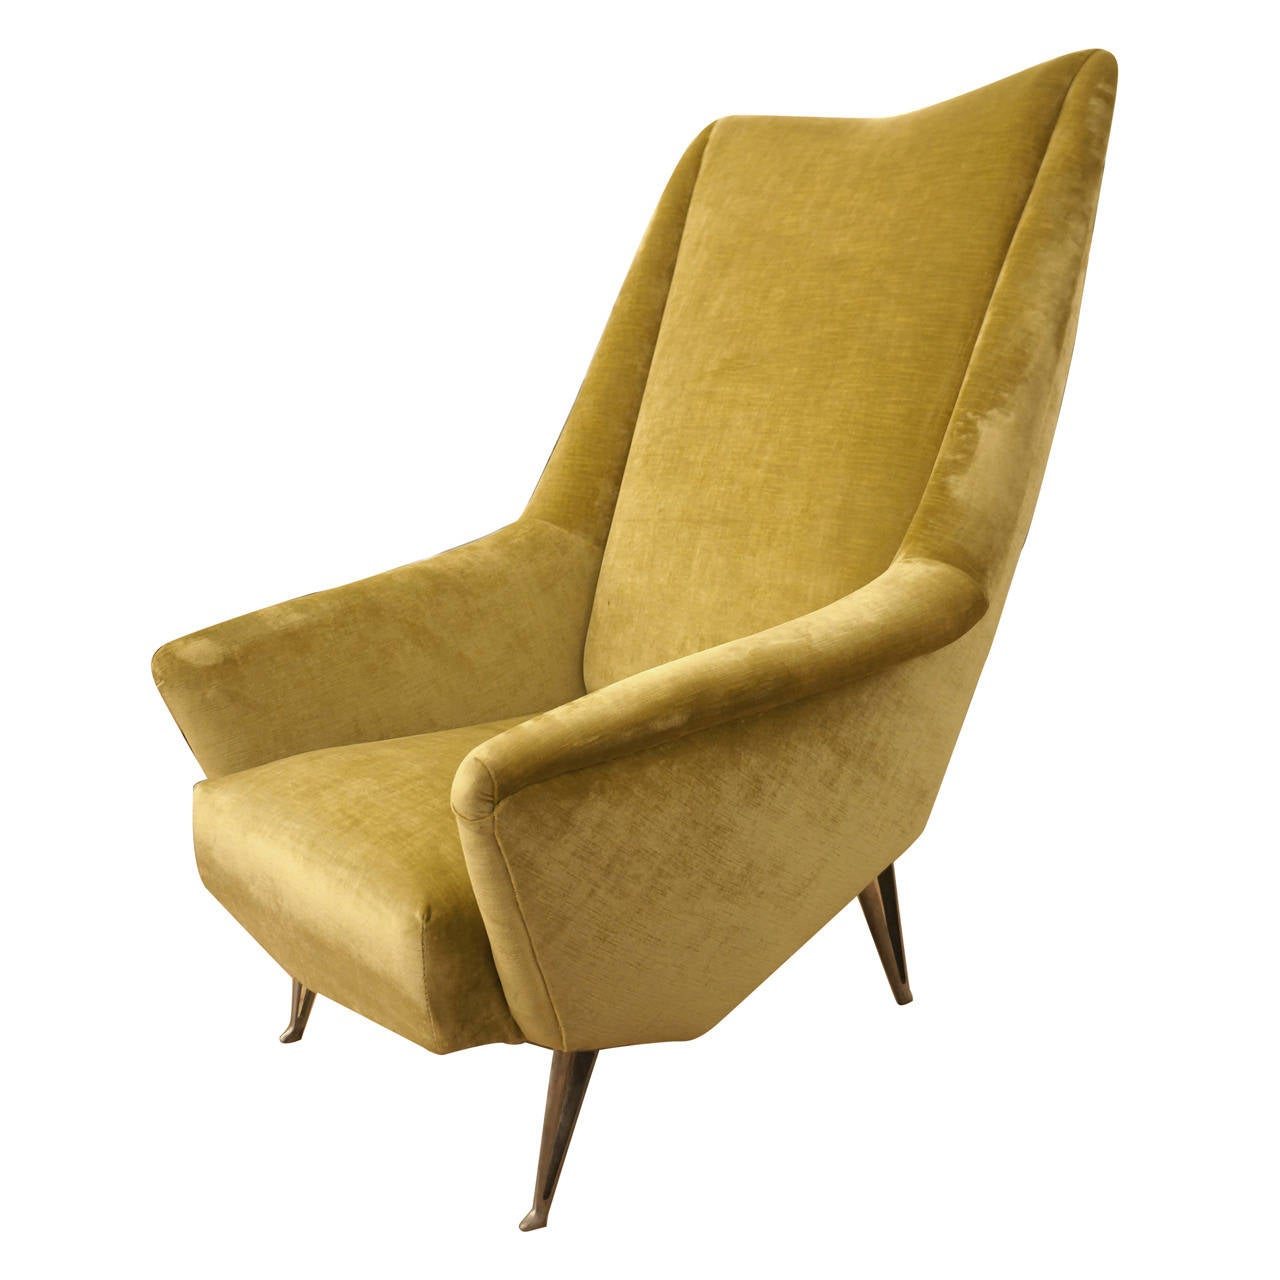 Design Forward And Comfortable Italian Mid Century Lounge